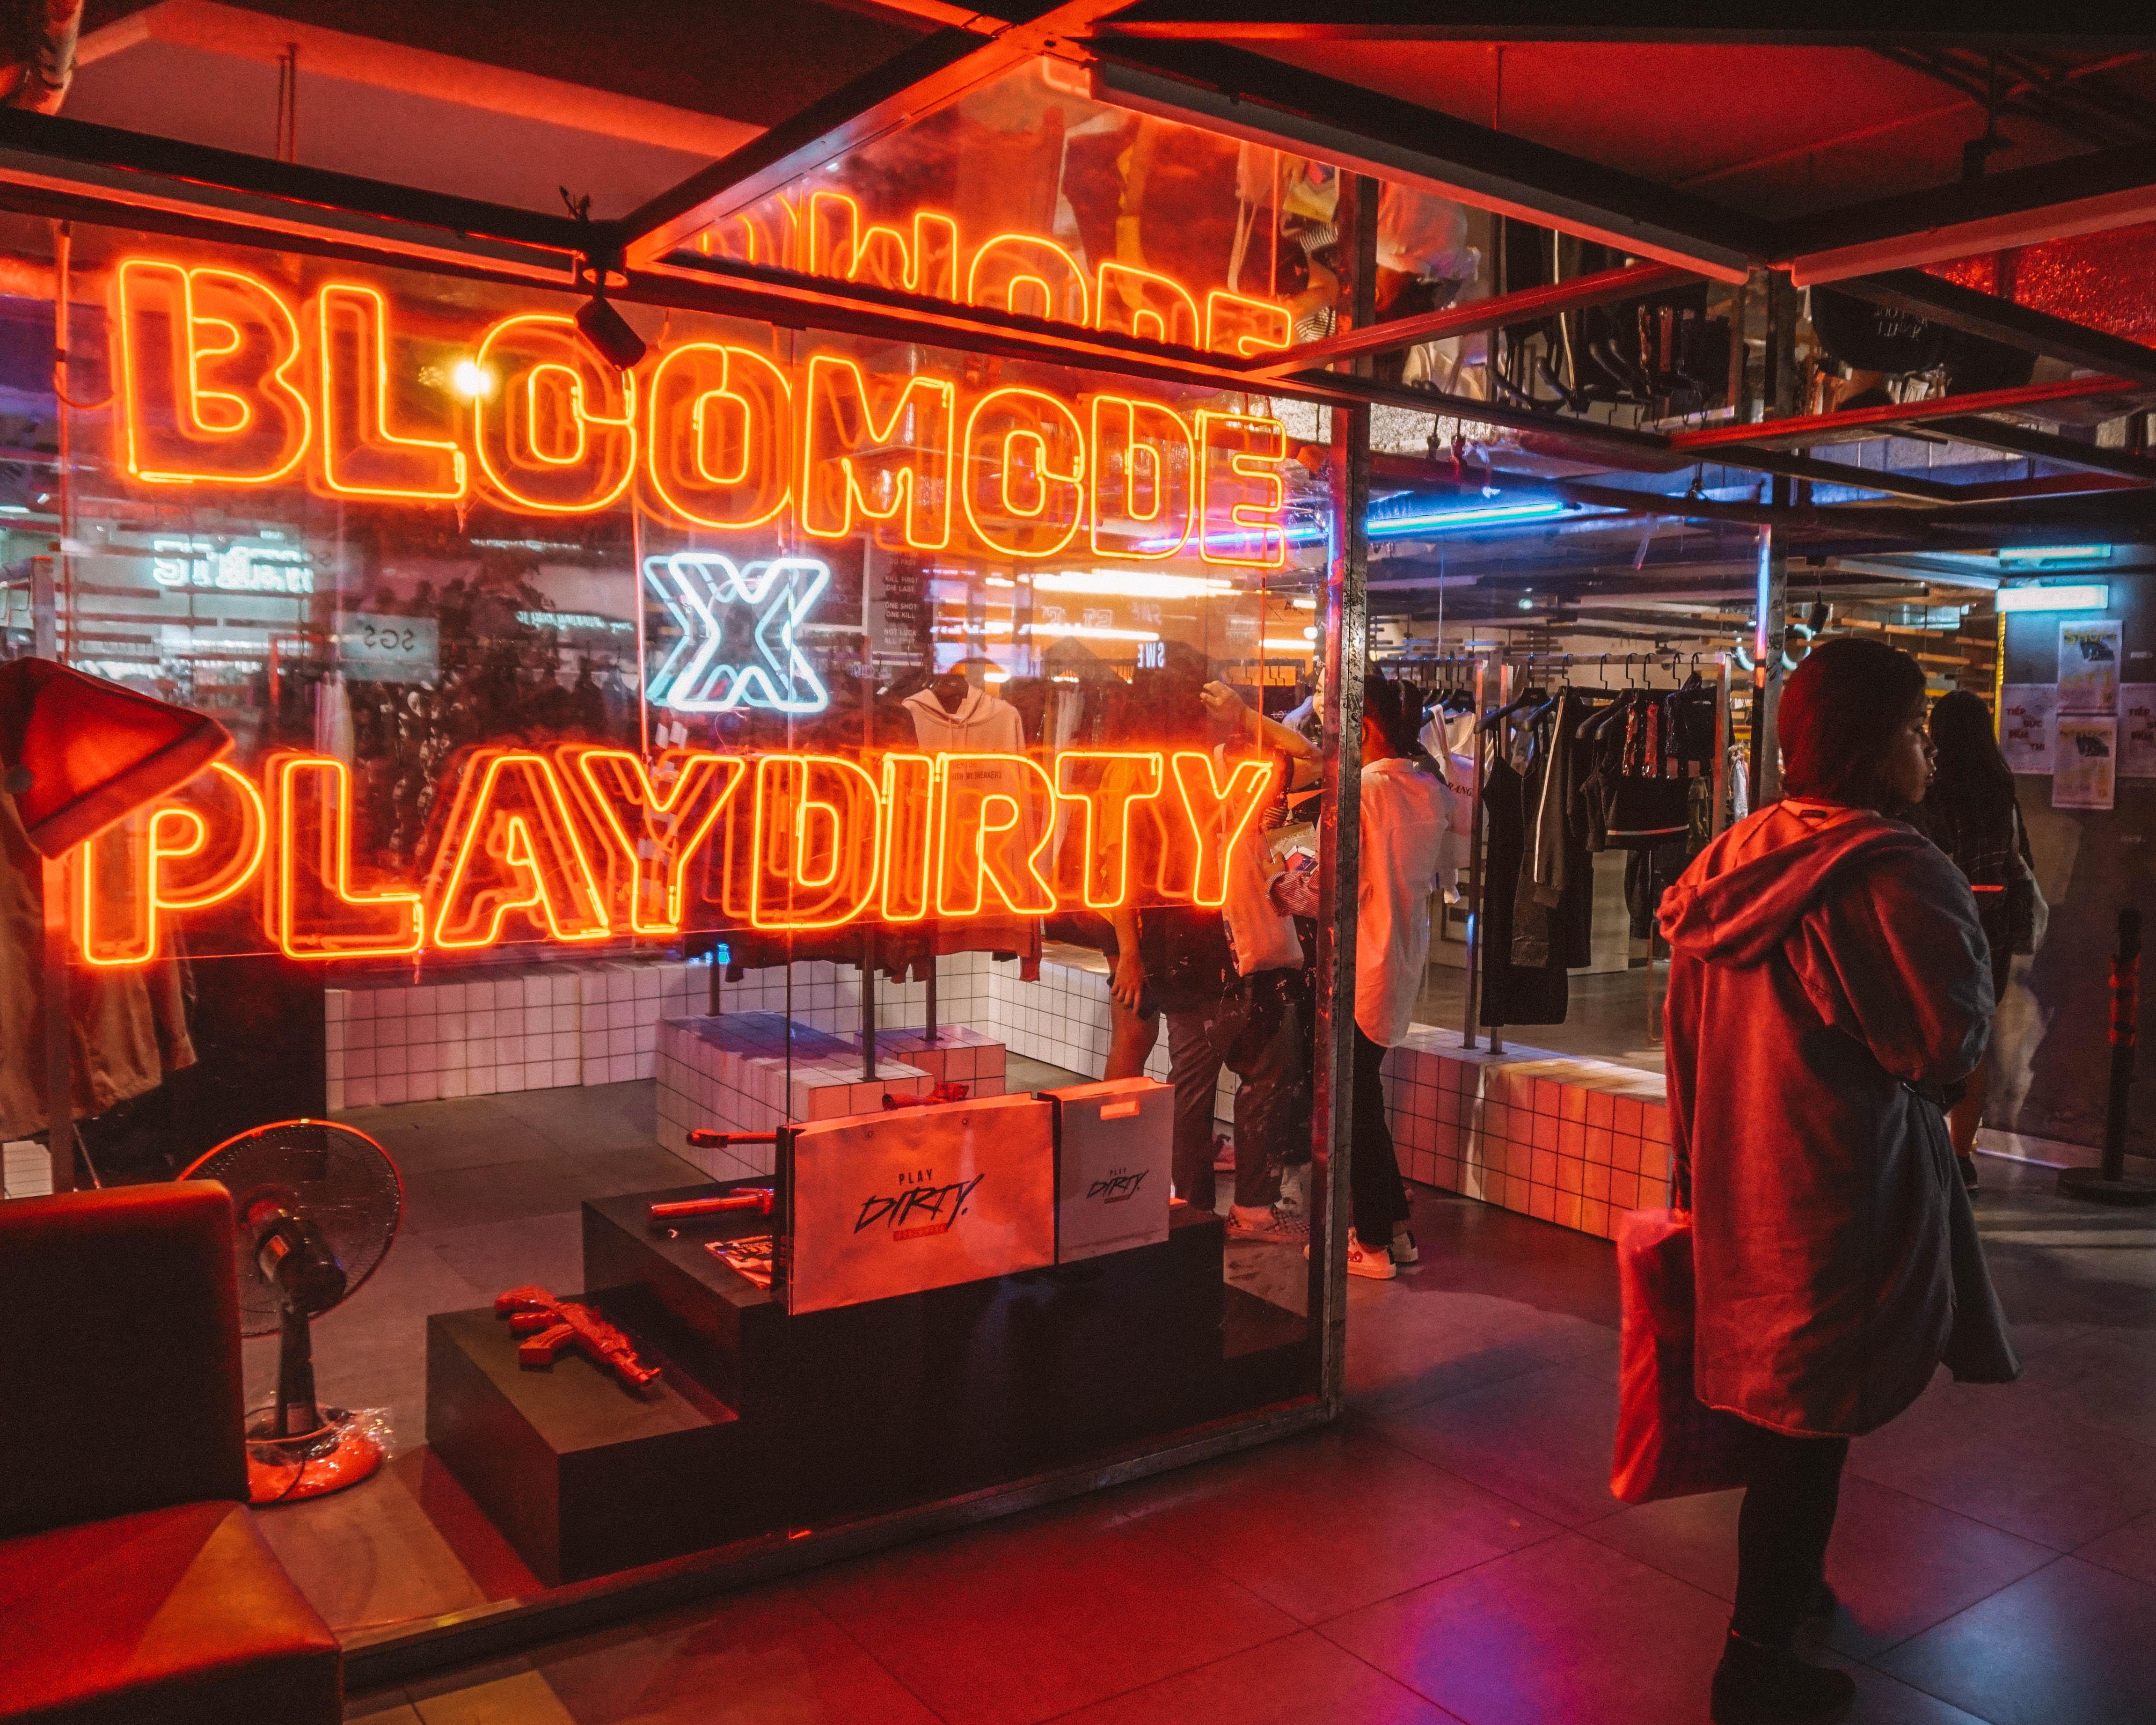 exploring the Ho Chi Minh city apartment malls Vietnam Saigon new underground playground